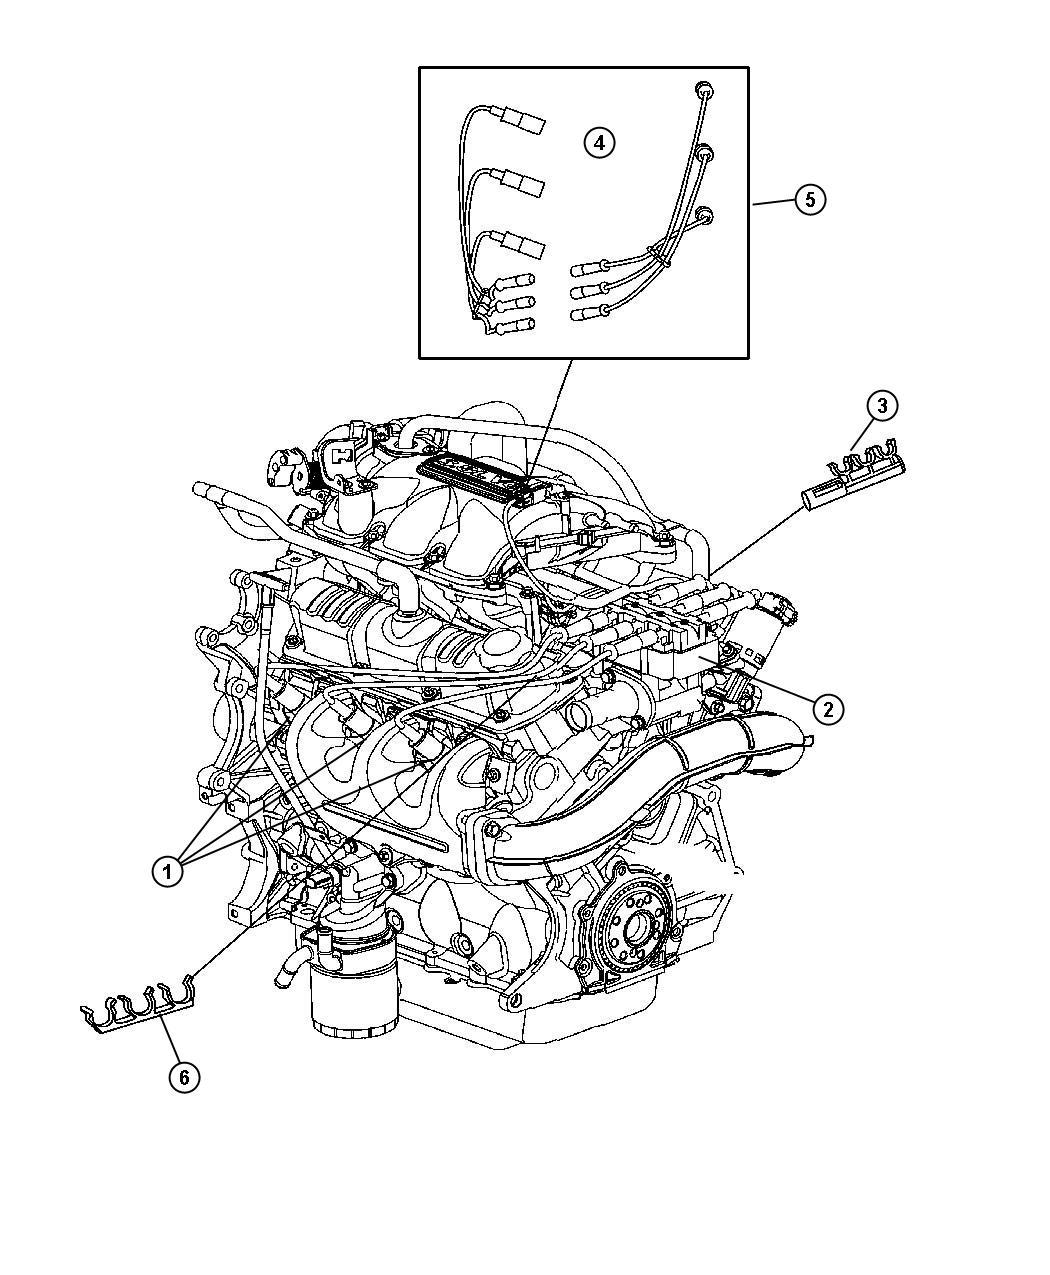 2001 dodge caravan sparkplug  plugs  ignition  cables